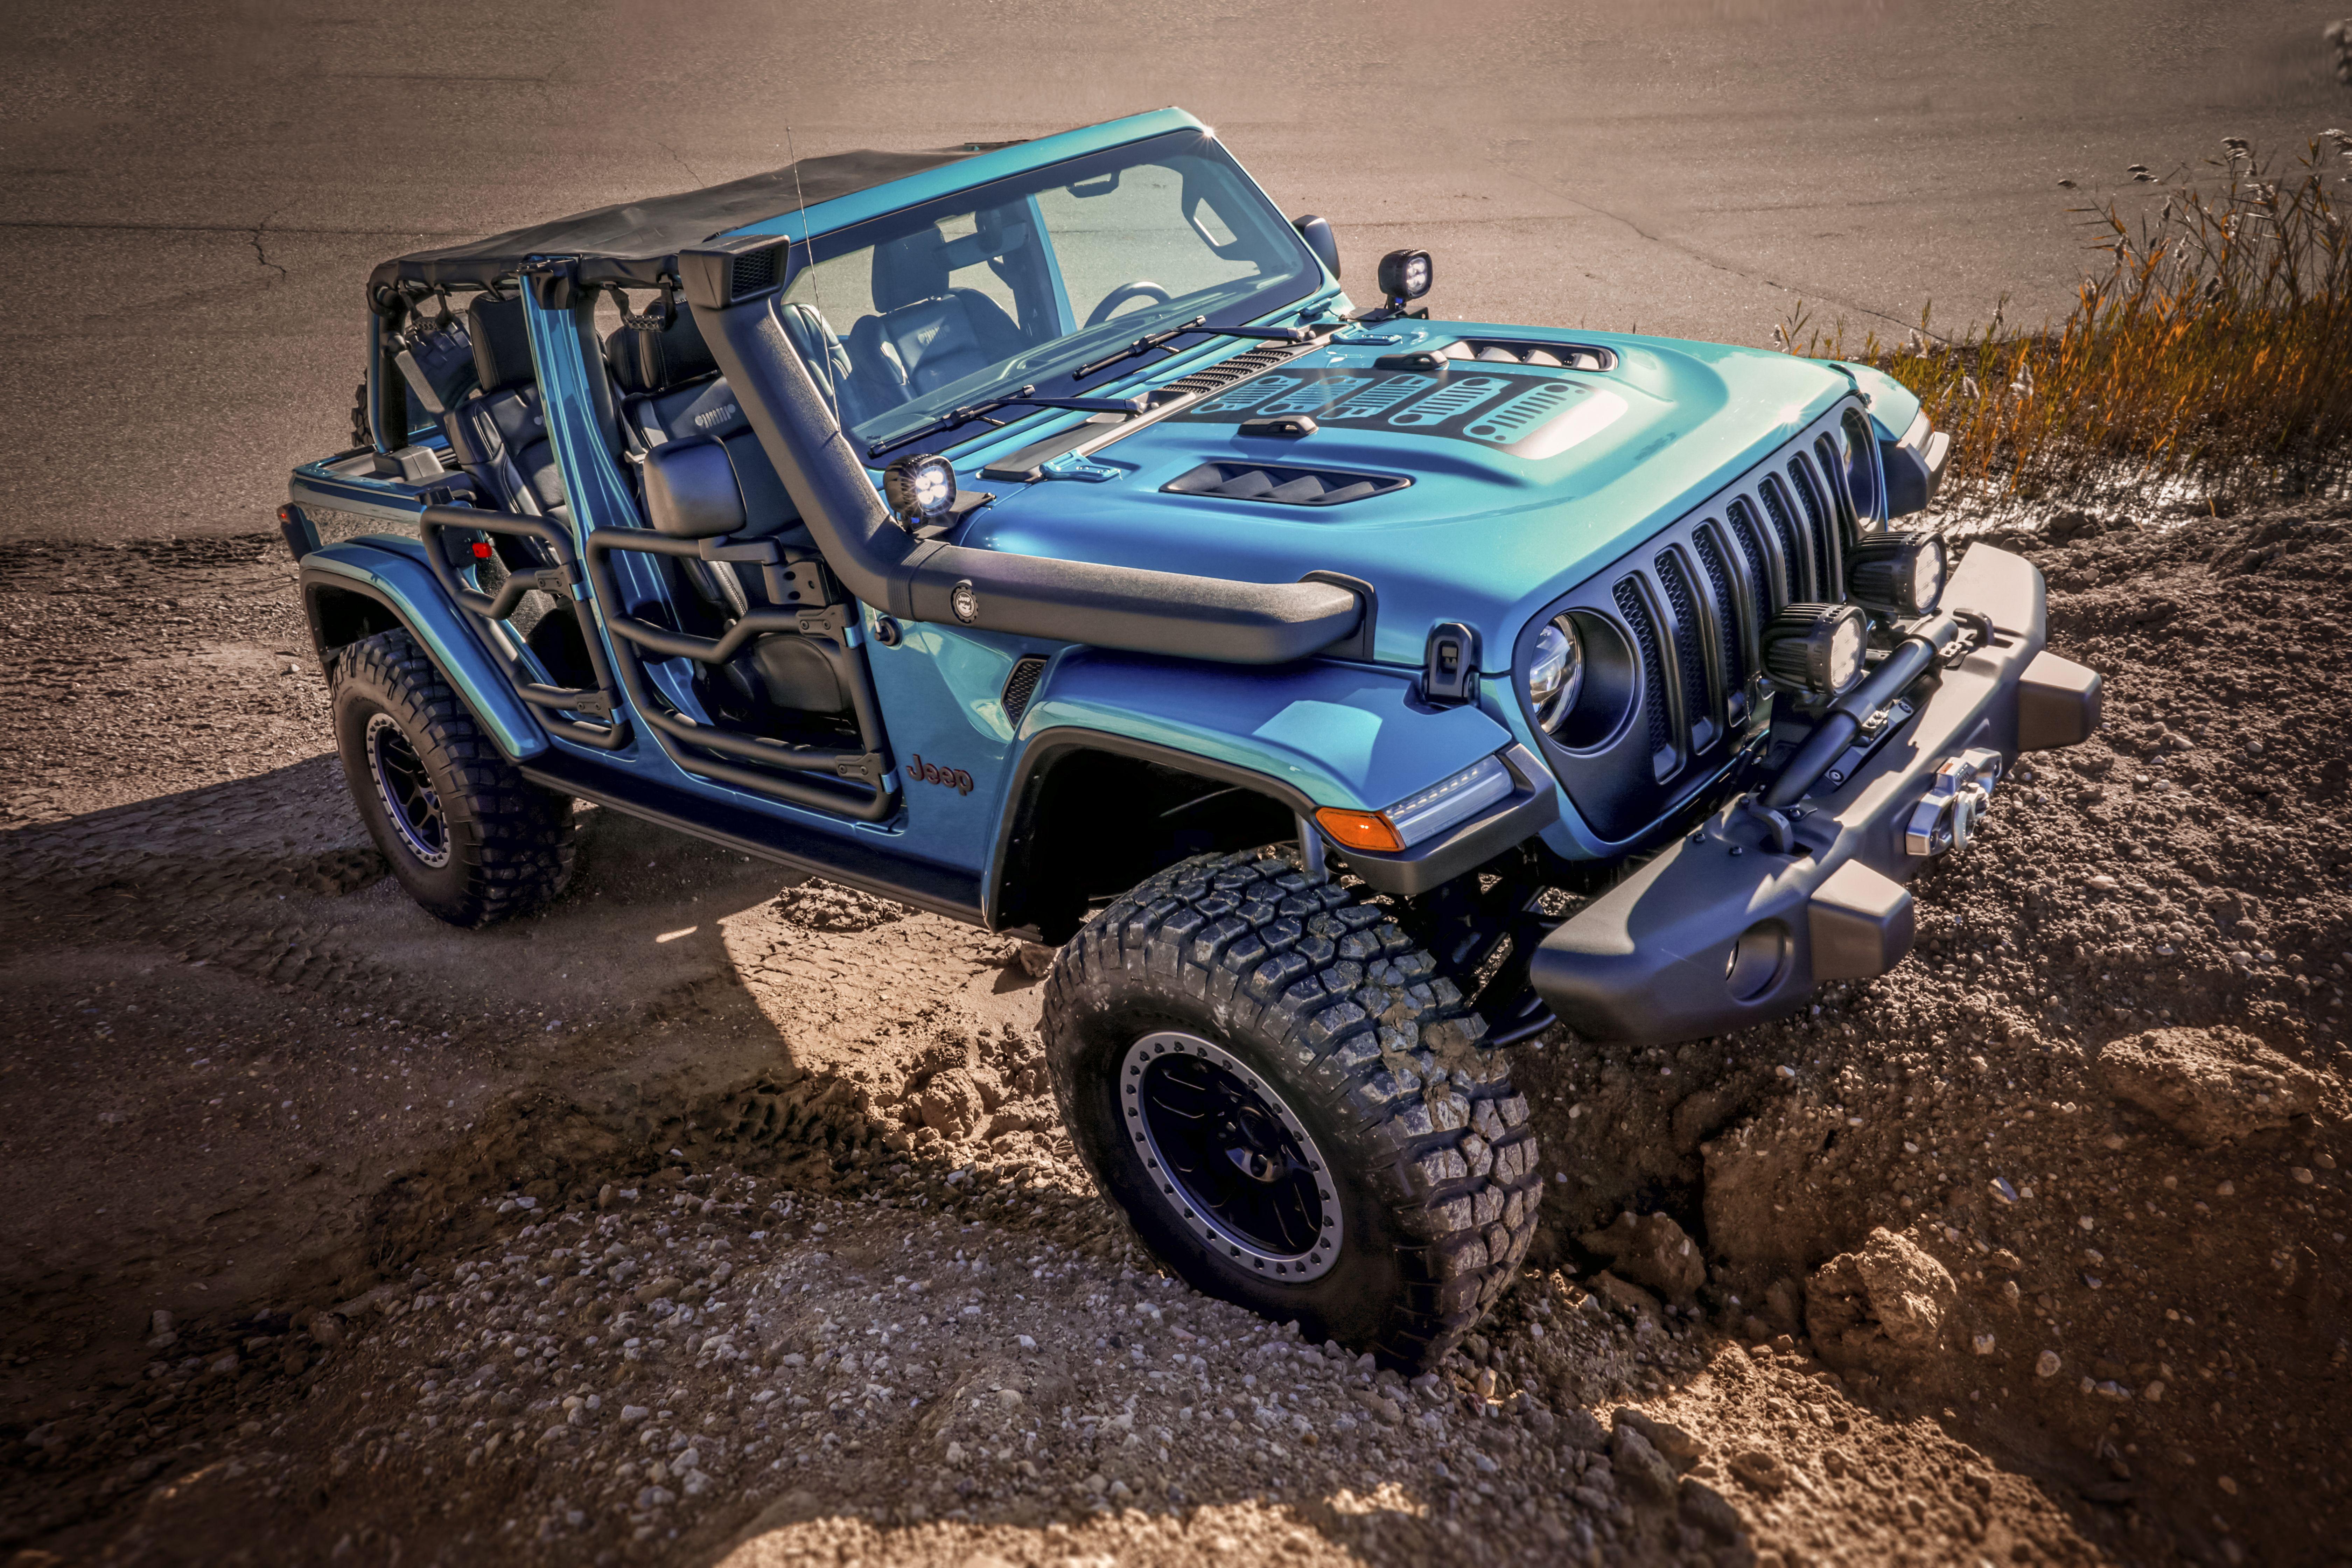 Moparized Jeep Wrangler Rubicon Jl Love The Snorkel In 2020